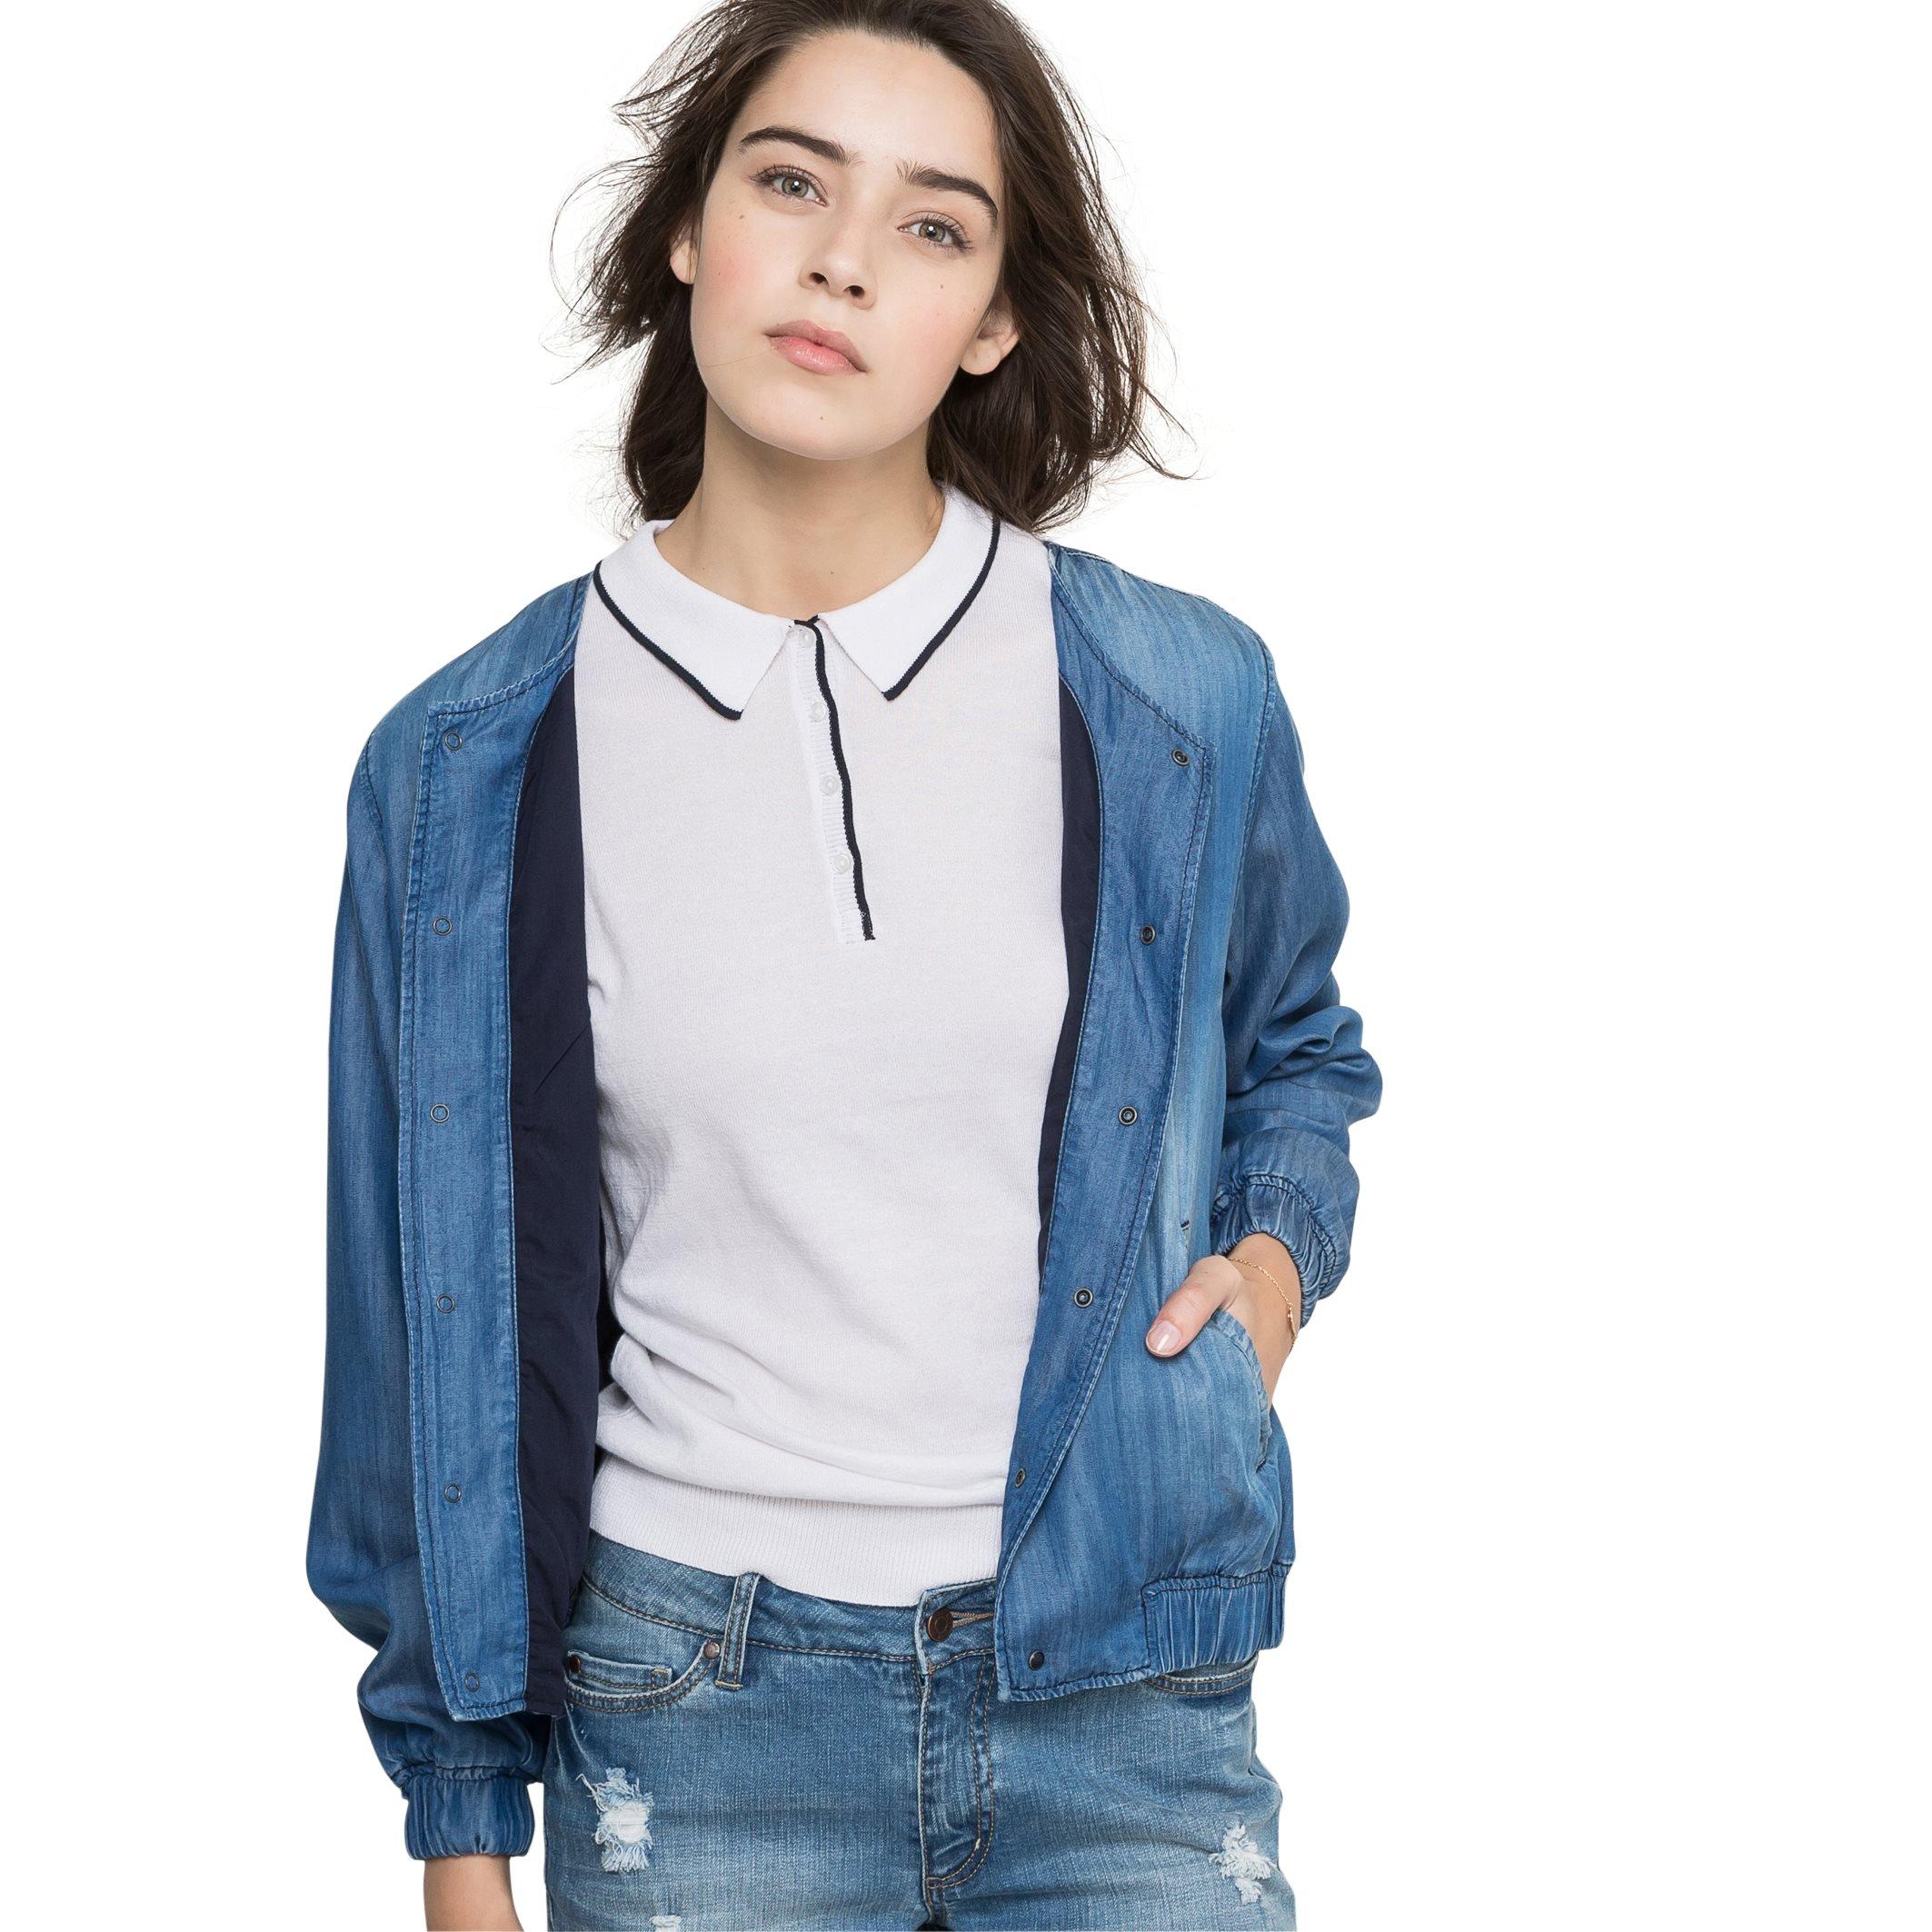 Cimarron Womens Denim Look Bomber Jacket Blue Size S